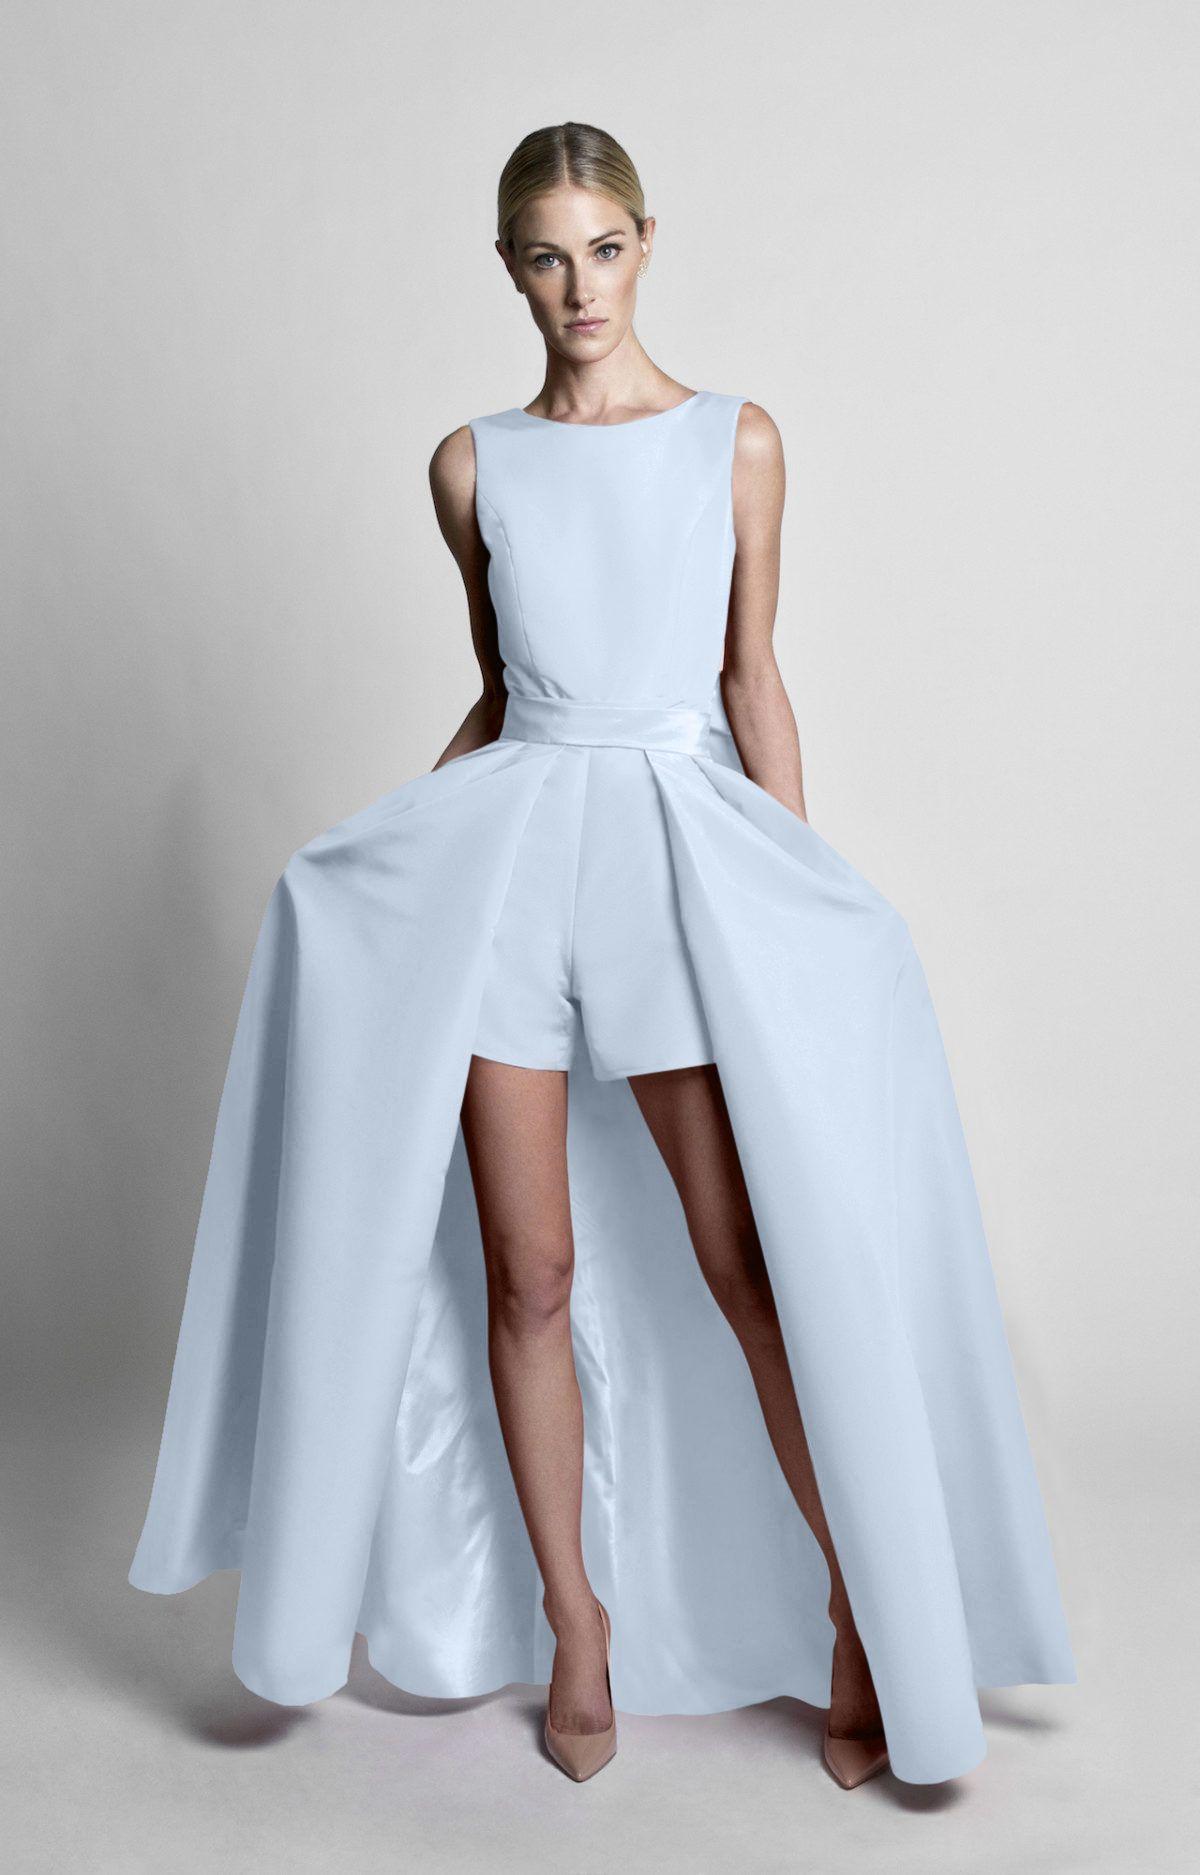 Pantsuit Prom Dress